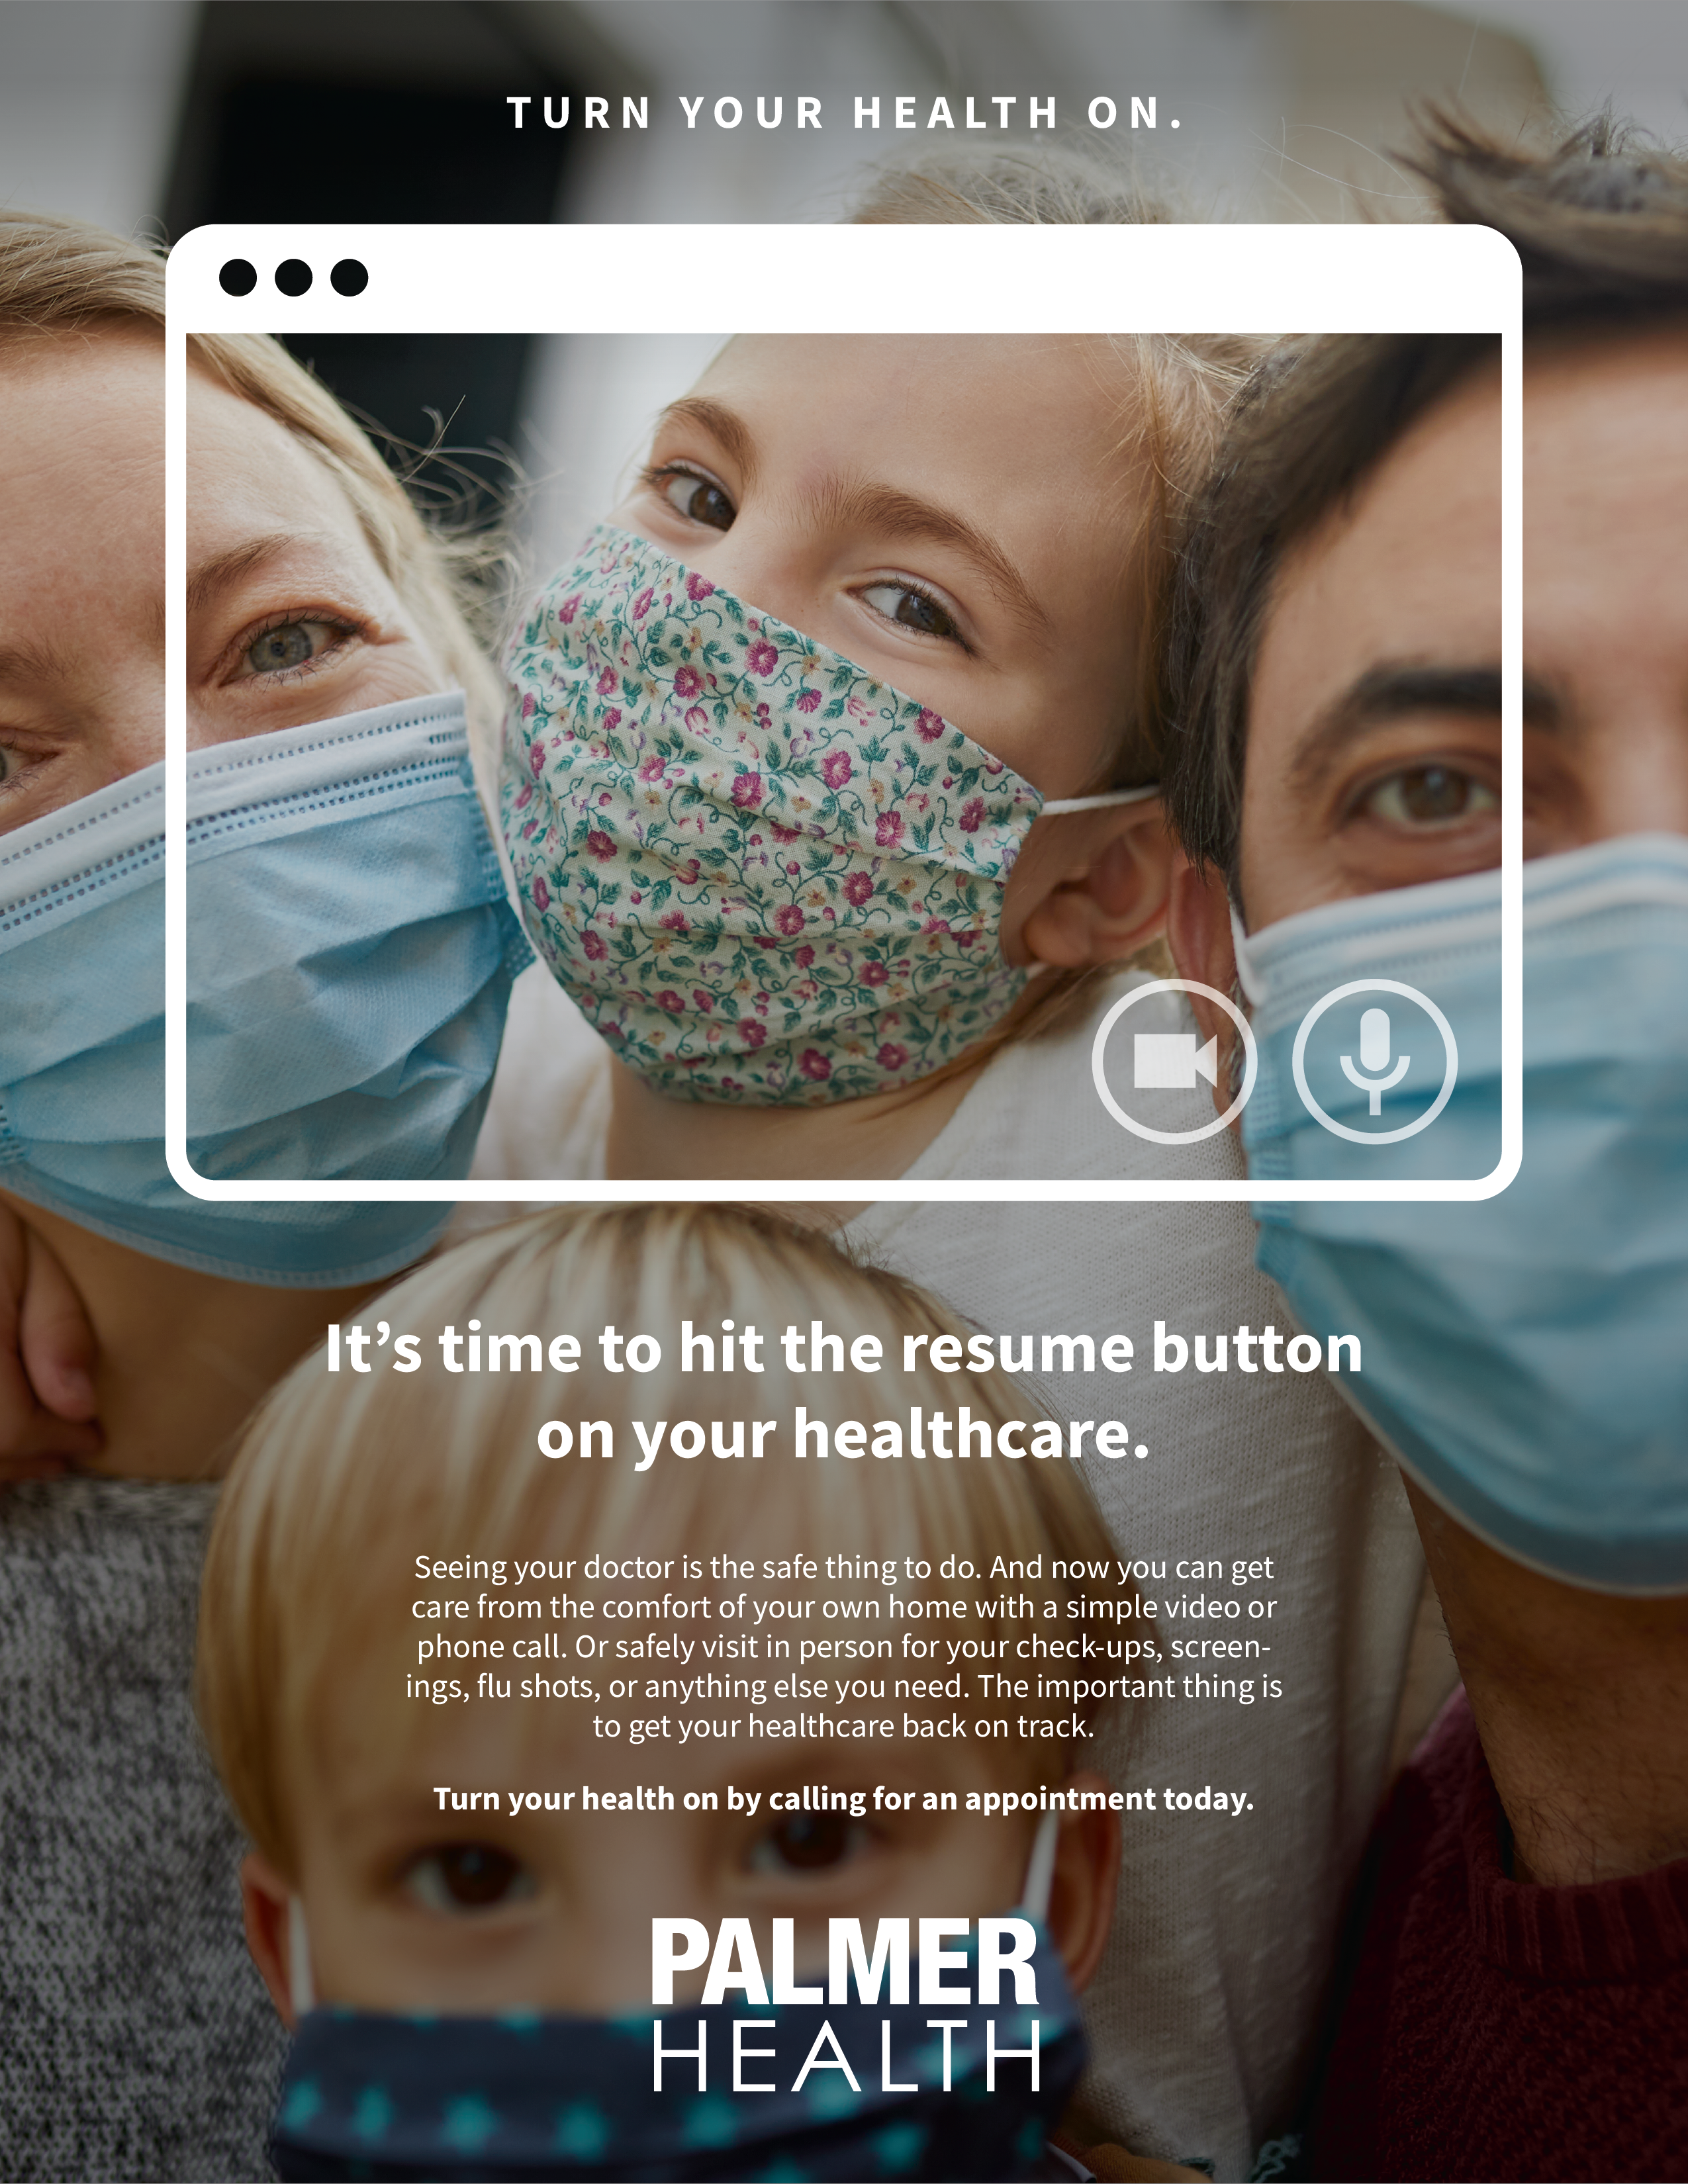 36152 Palmer health as dev for website-turn your health on-v4-aug 20-04